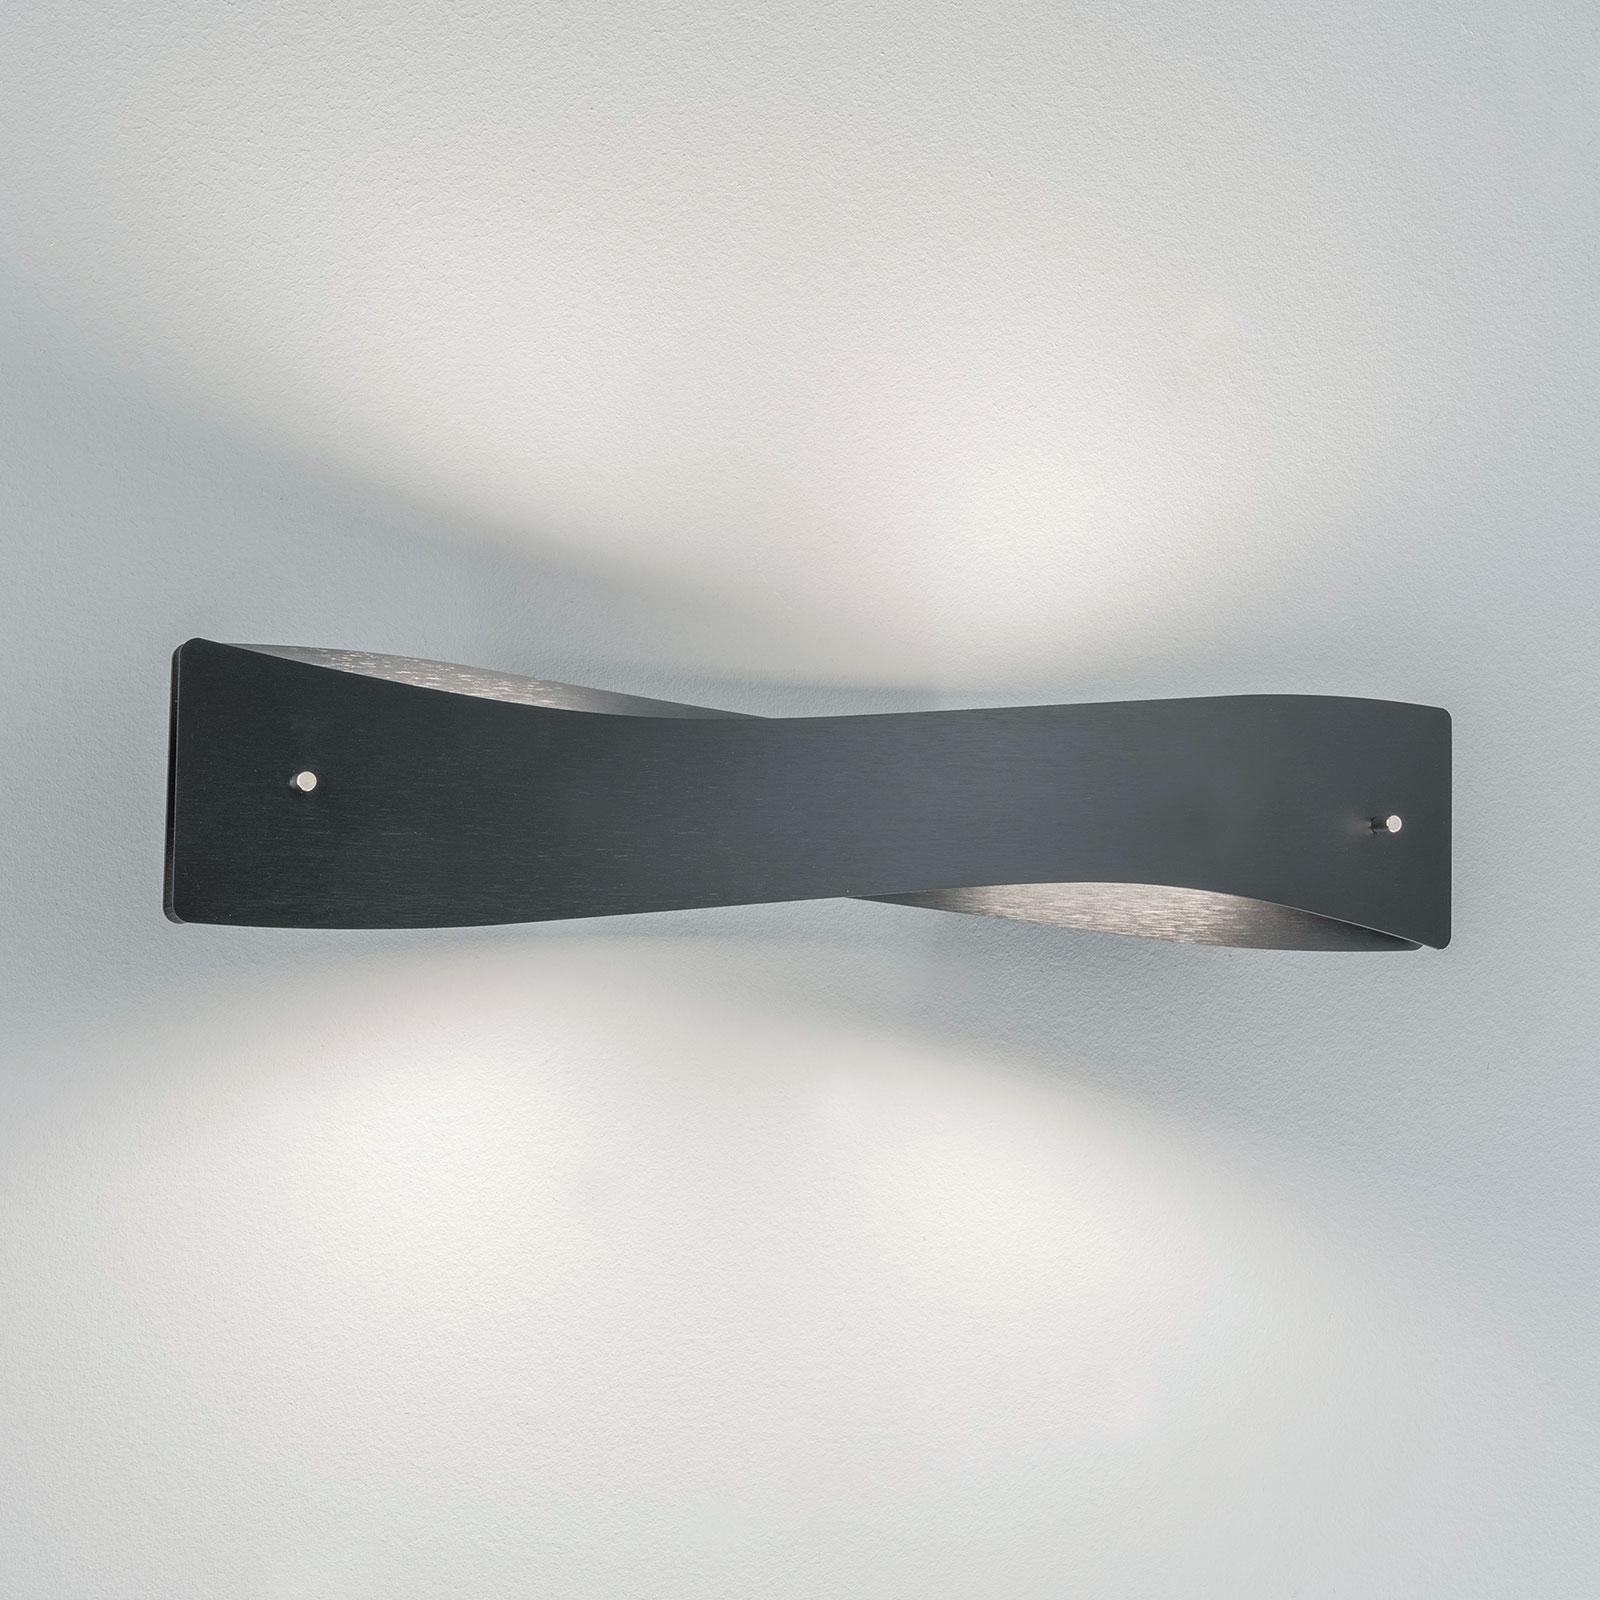 Lucande Lian LED-vägglampa, svart, aluminium